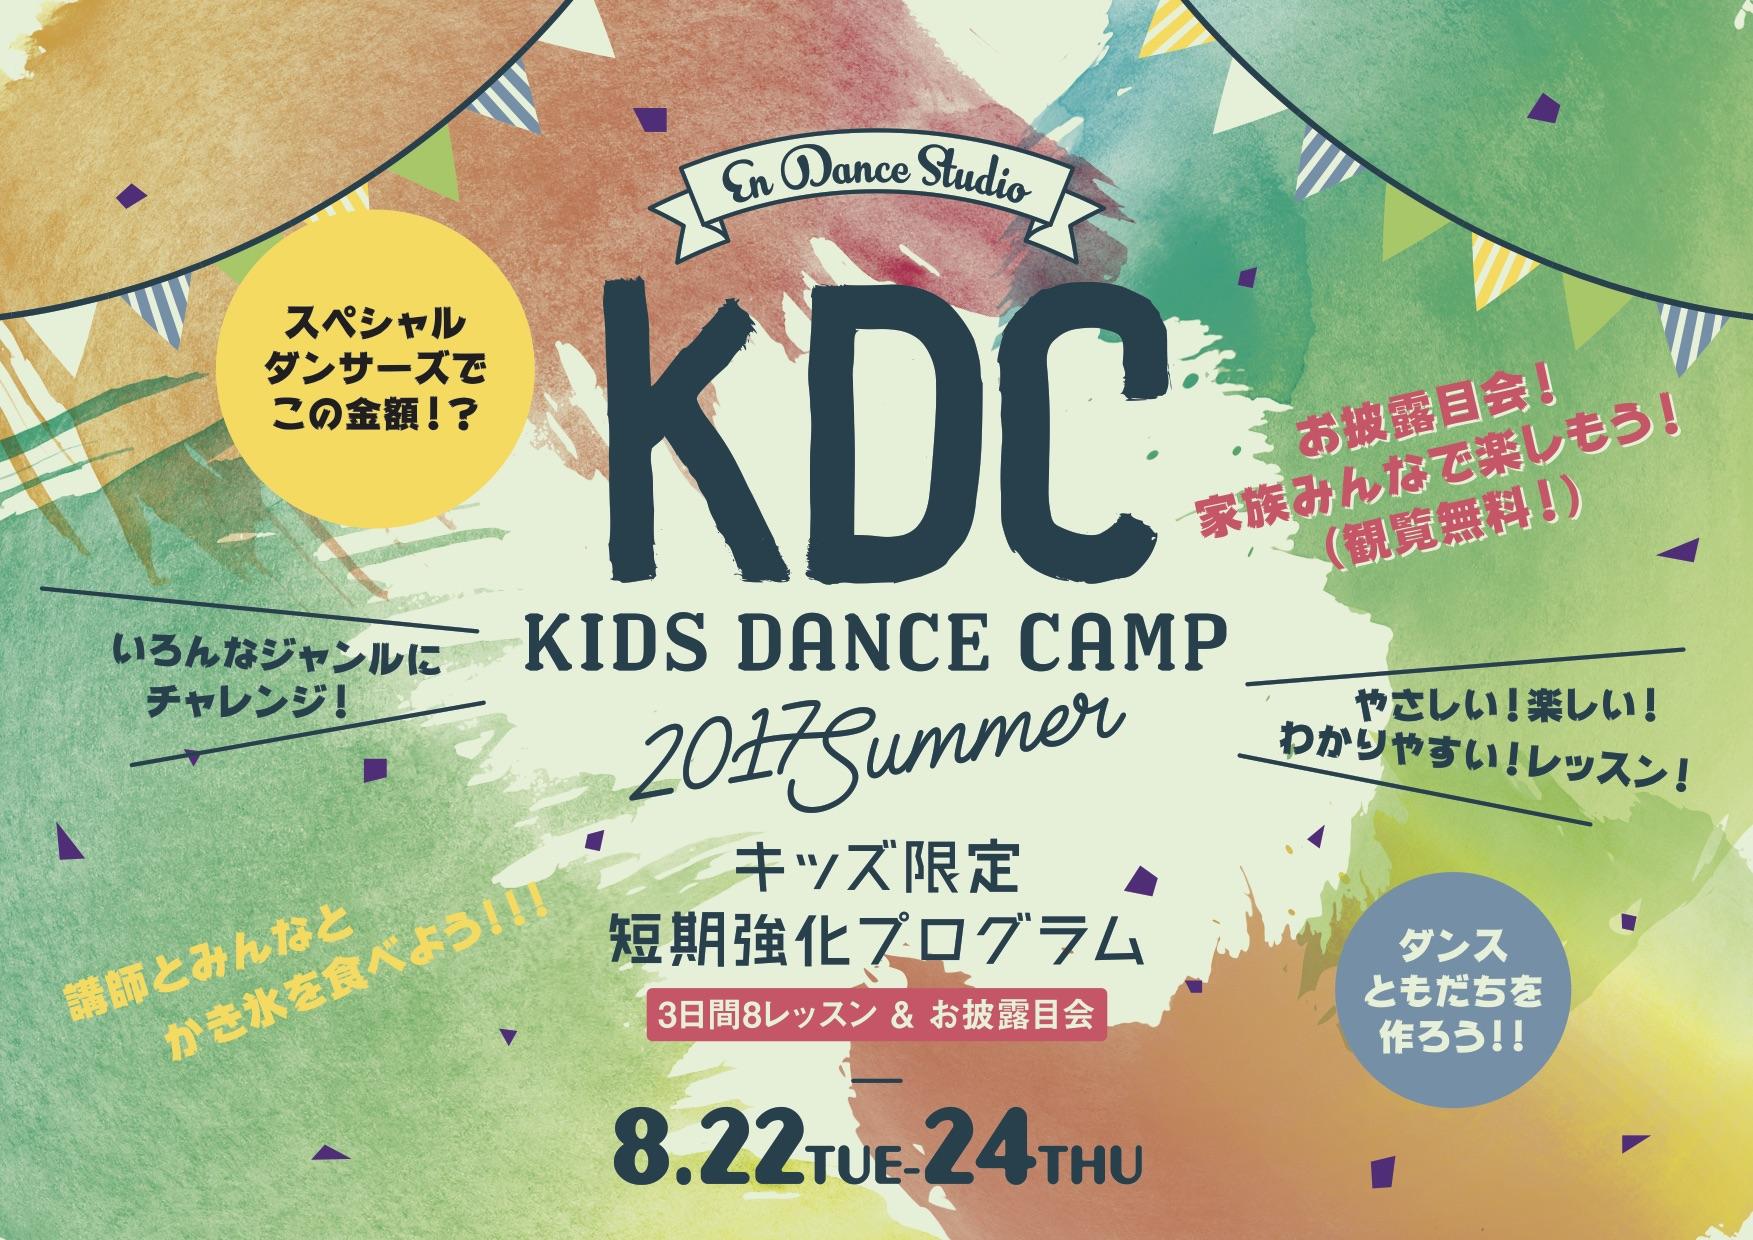 KDC0 Front